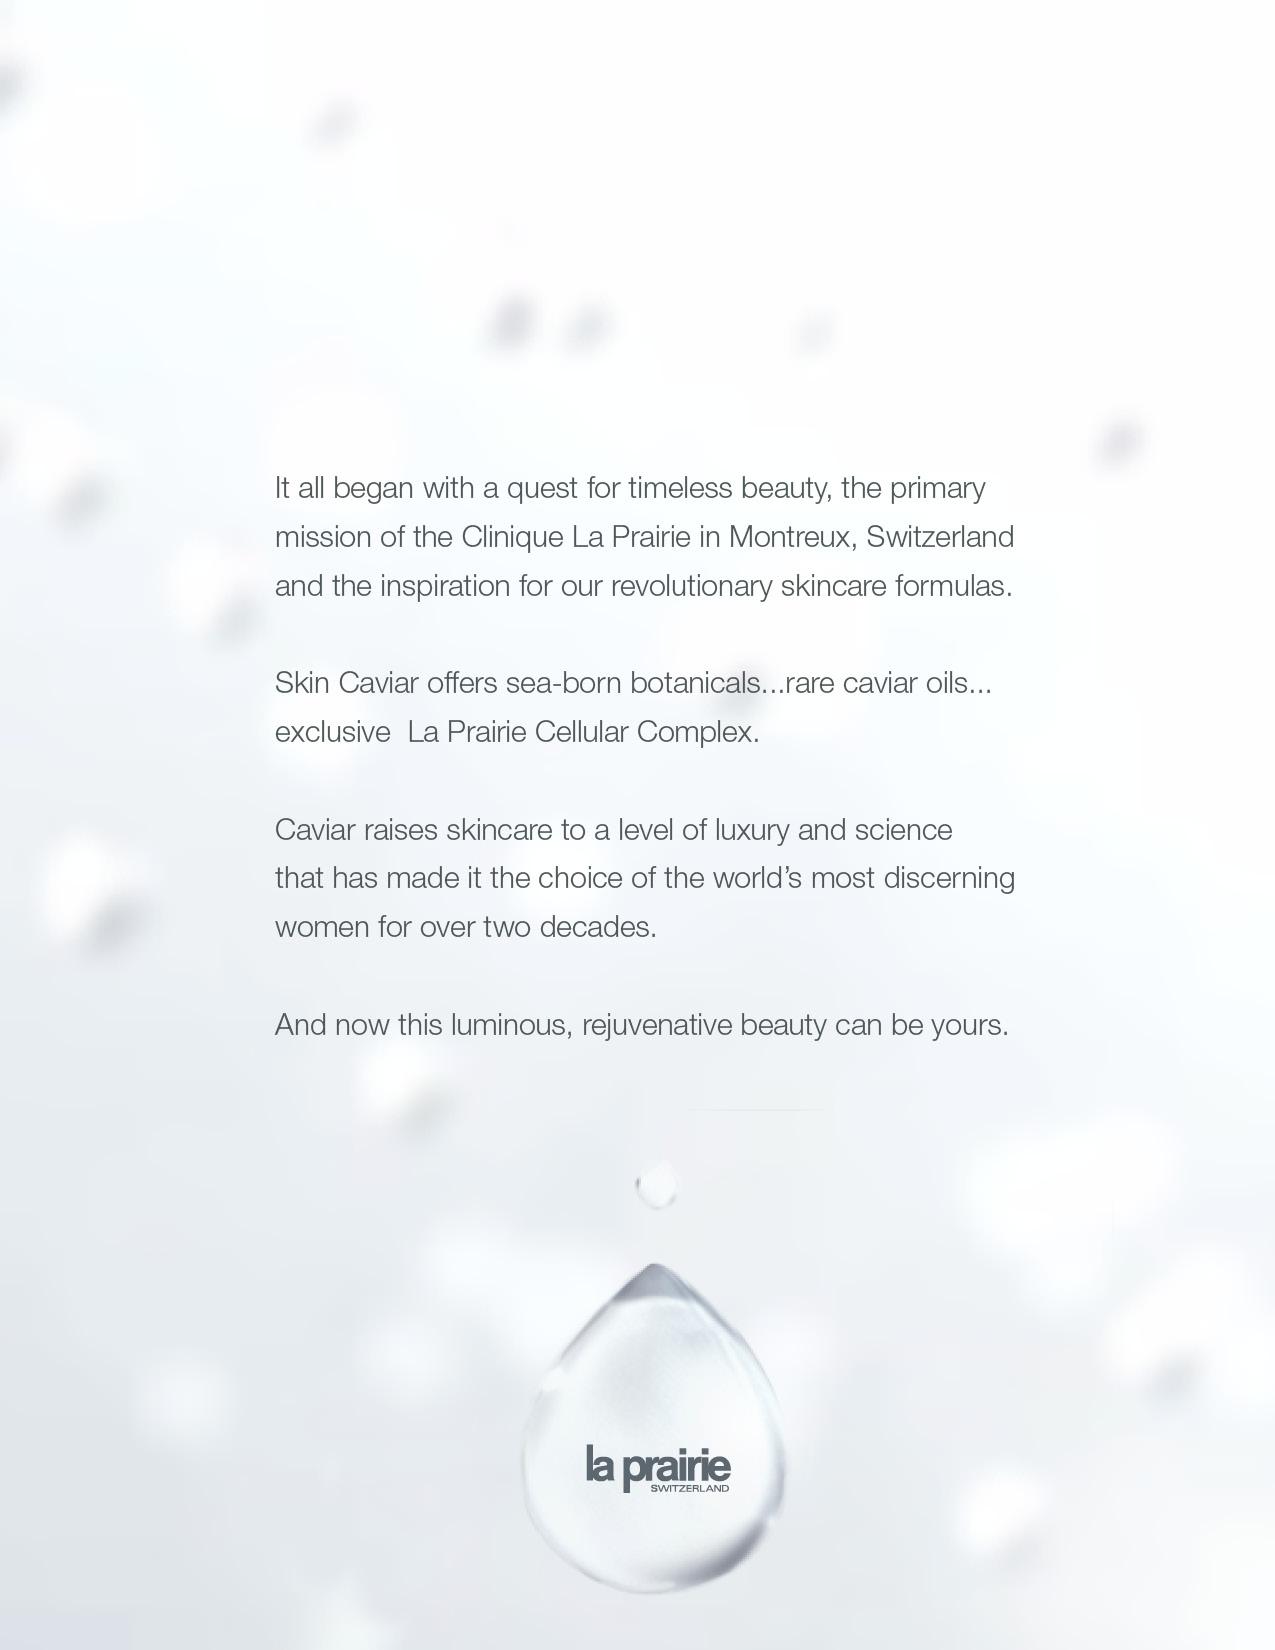 White Caviar Tear Drop Advertorial 5.jpg